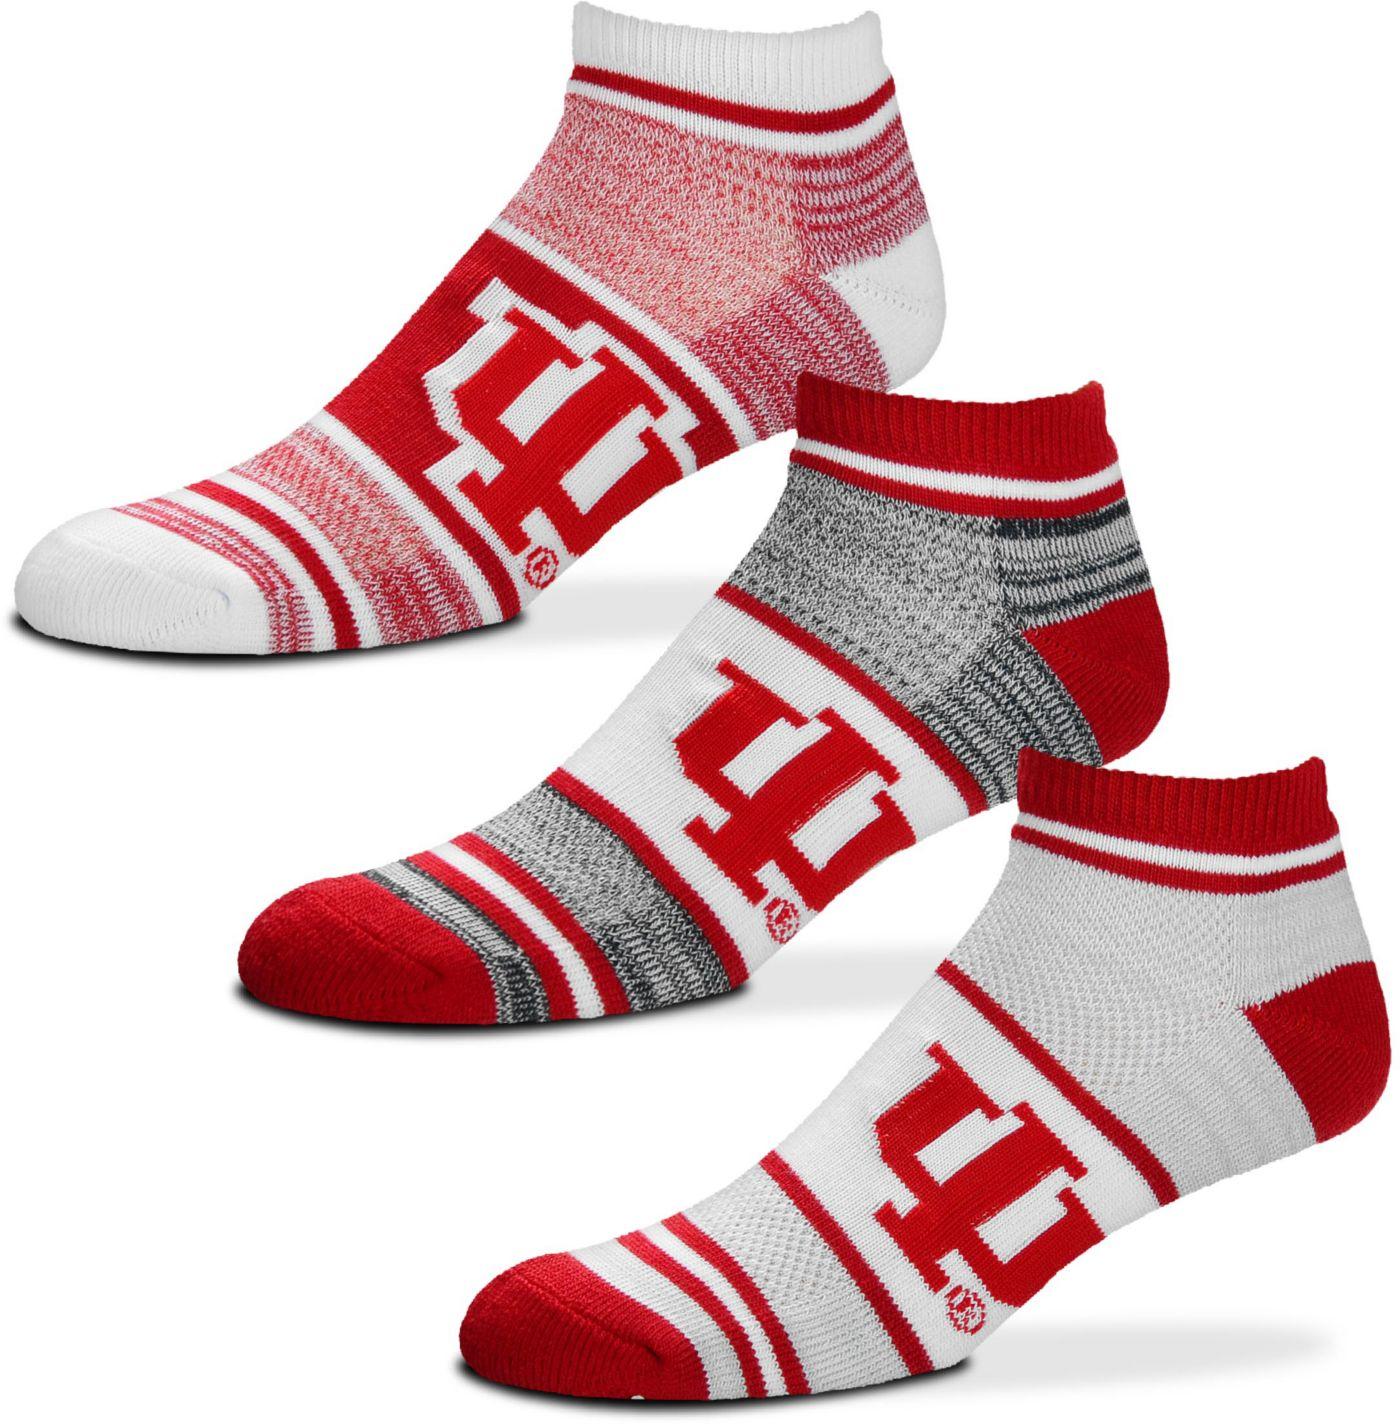 For Bare Feet Indiana Hoosiers 3 Pack Socks